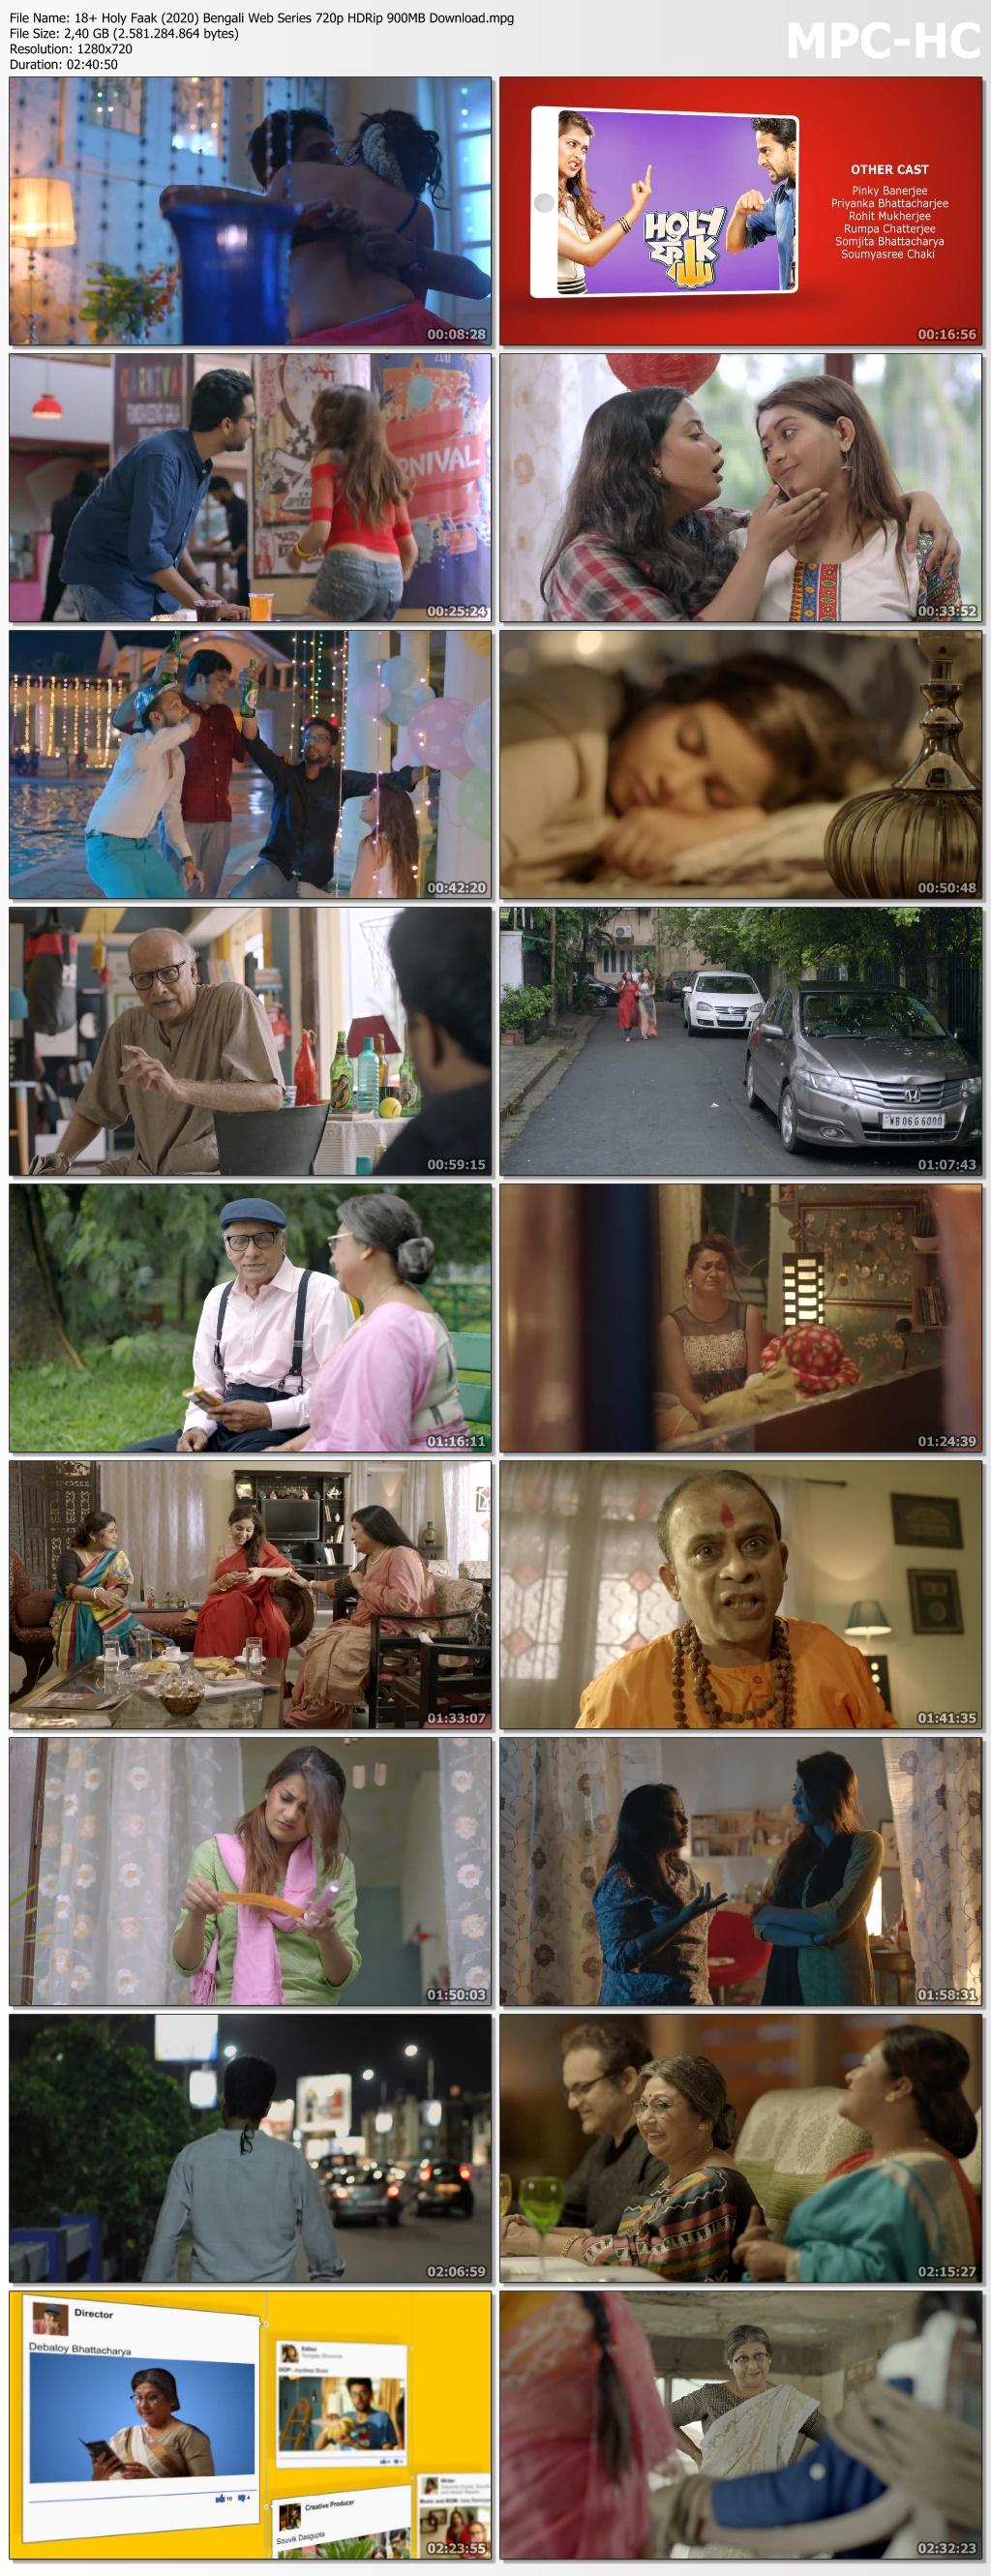 18-Holy-Faak-2020-Bengali-Web-Series-720p-HDRip-900-MB-Download-mpg-thumbs